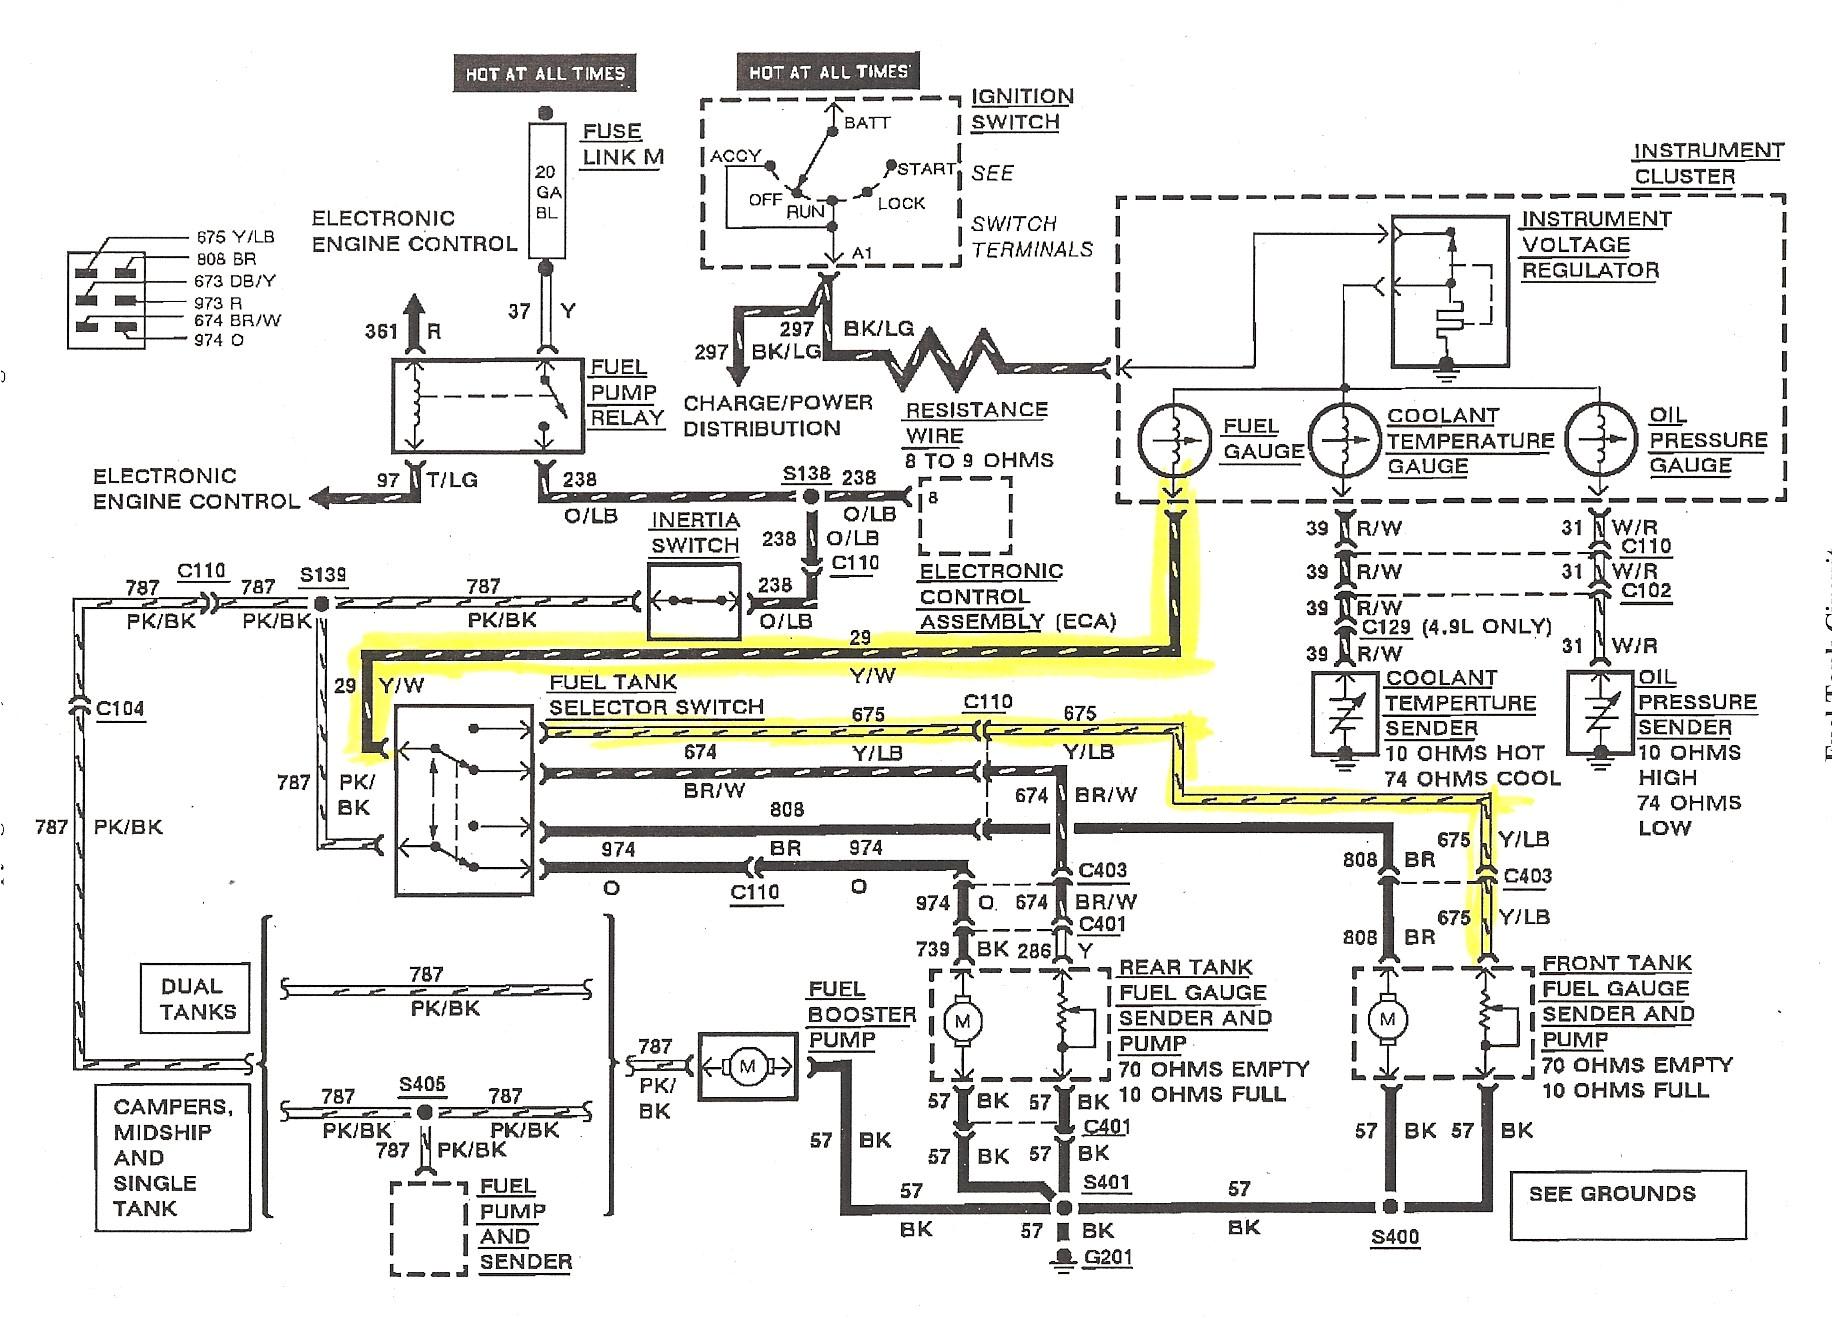 marine fuel gauge wiring diagram